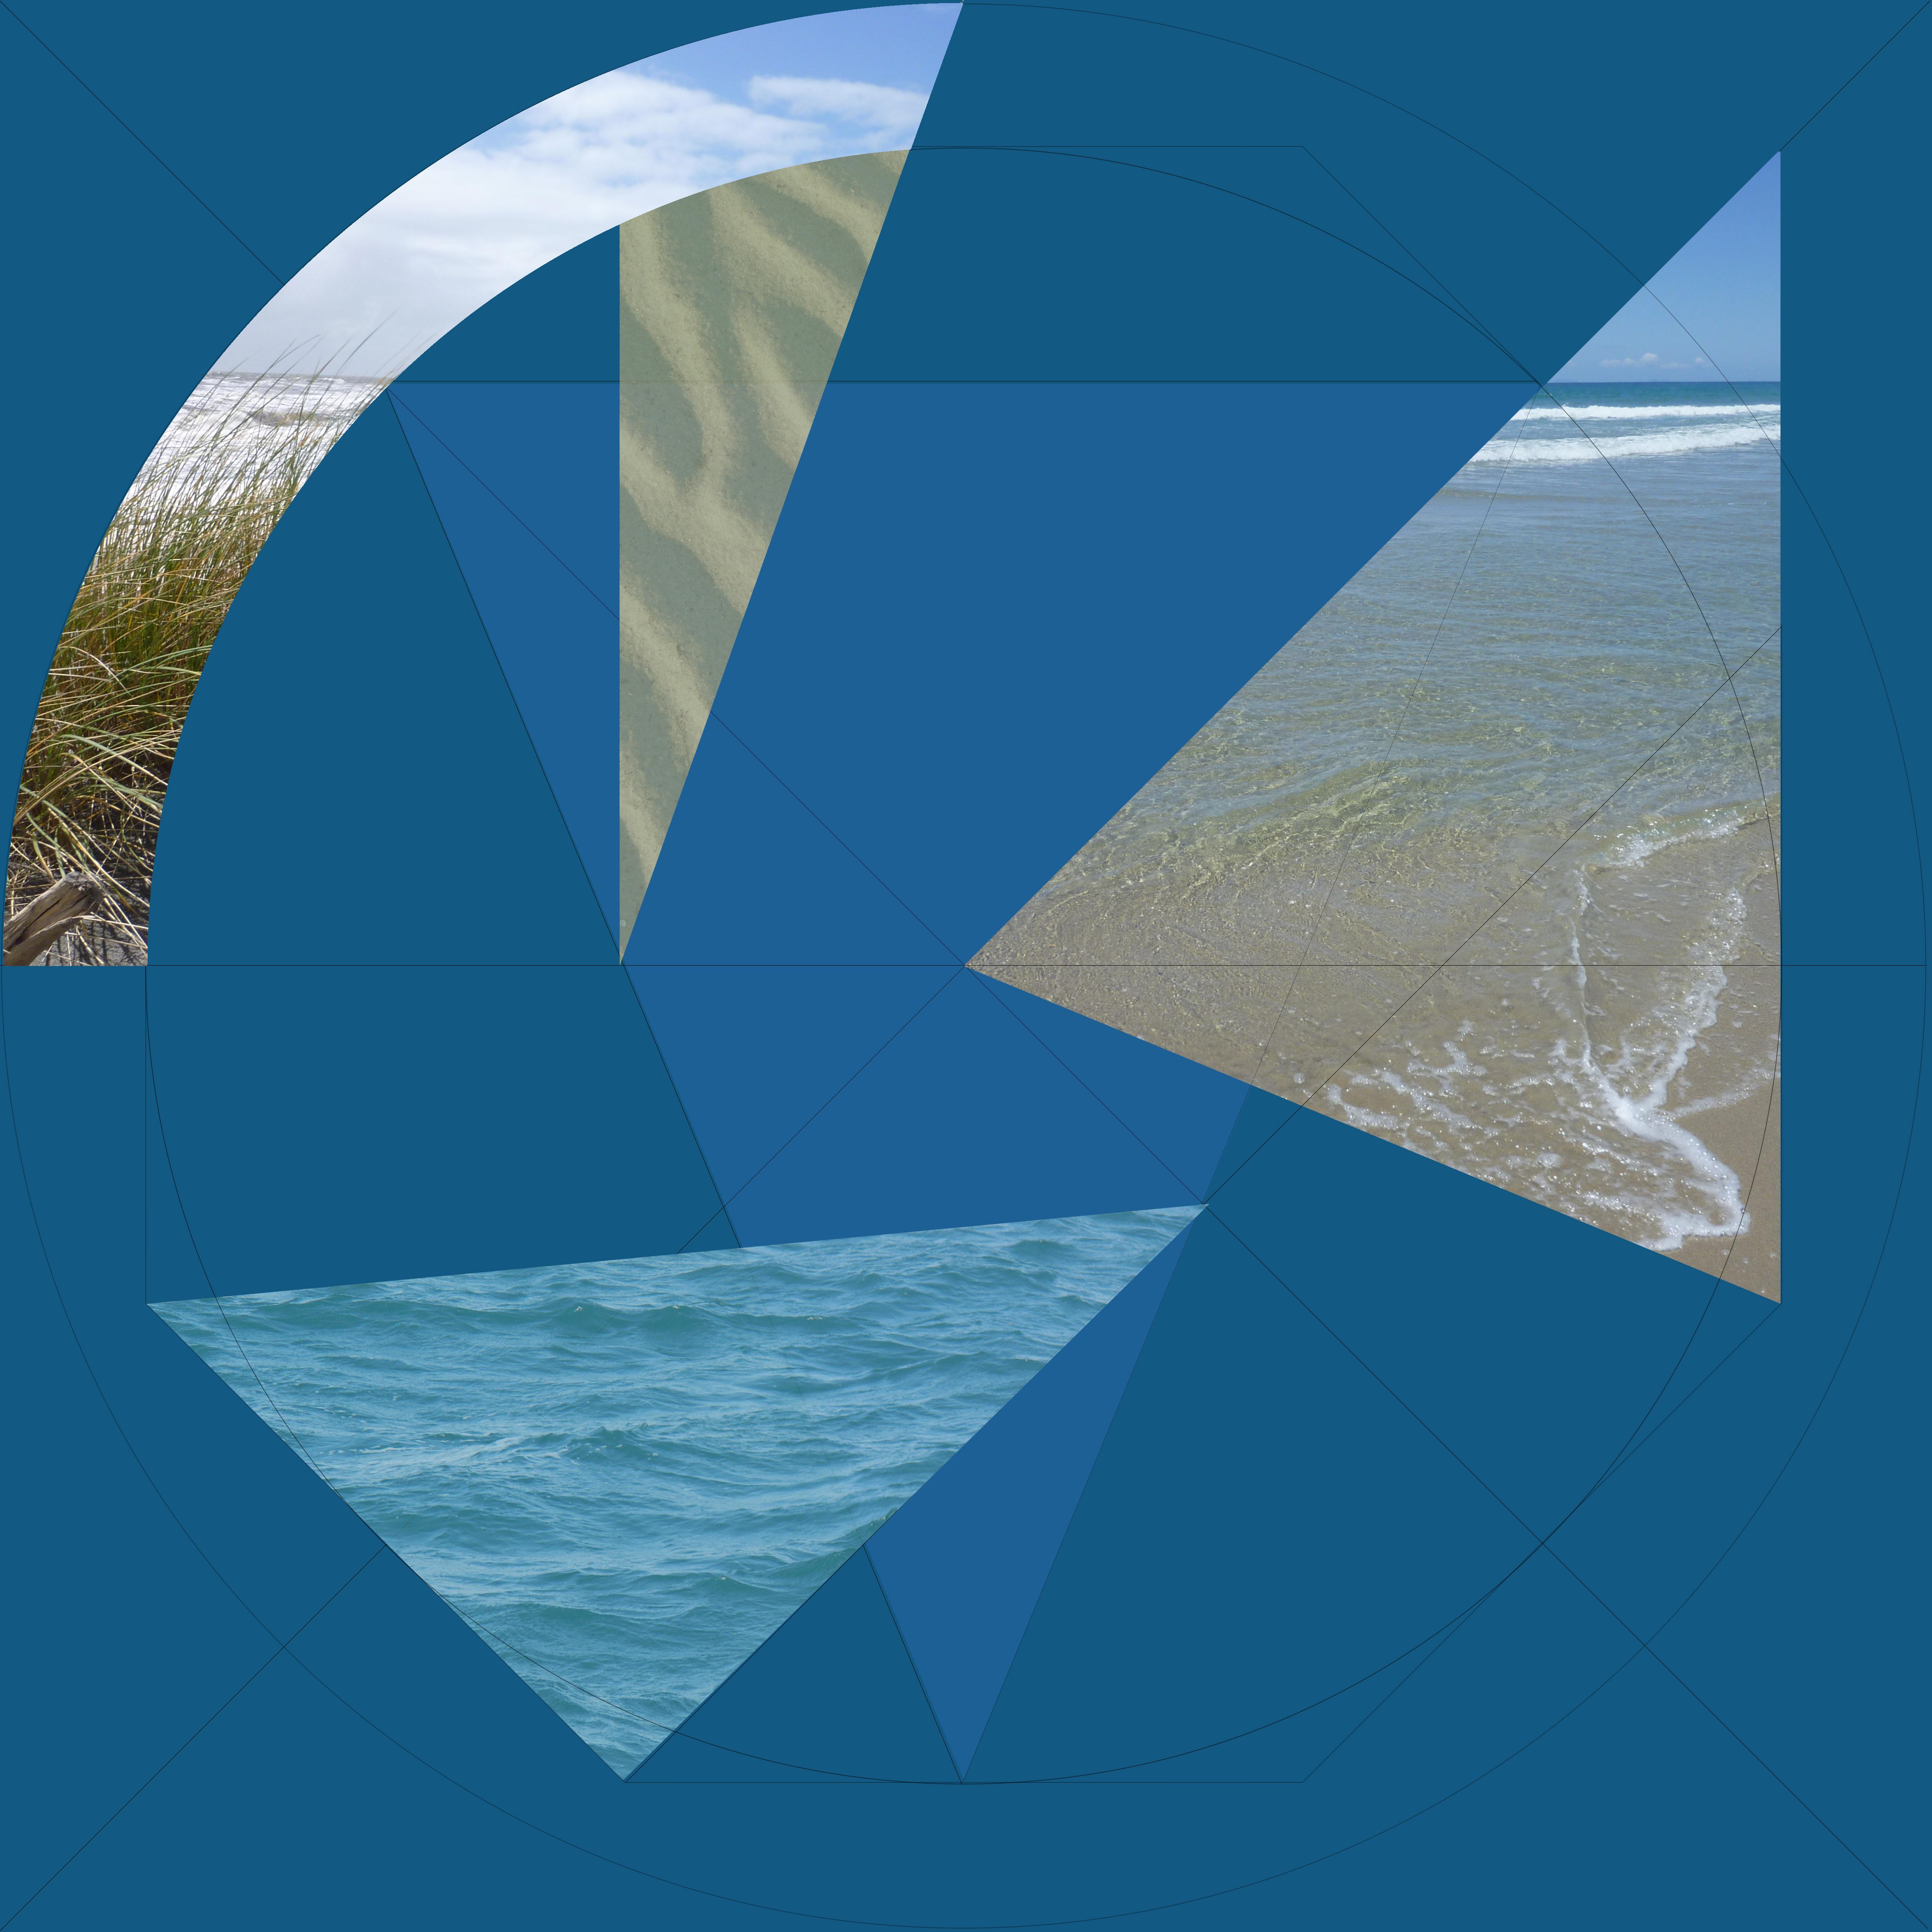 Sea, Sand, and Dunes